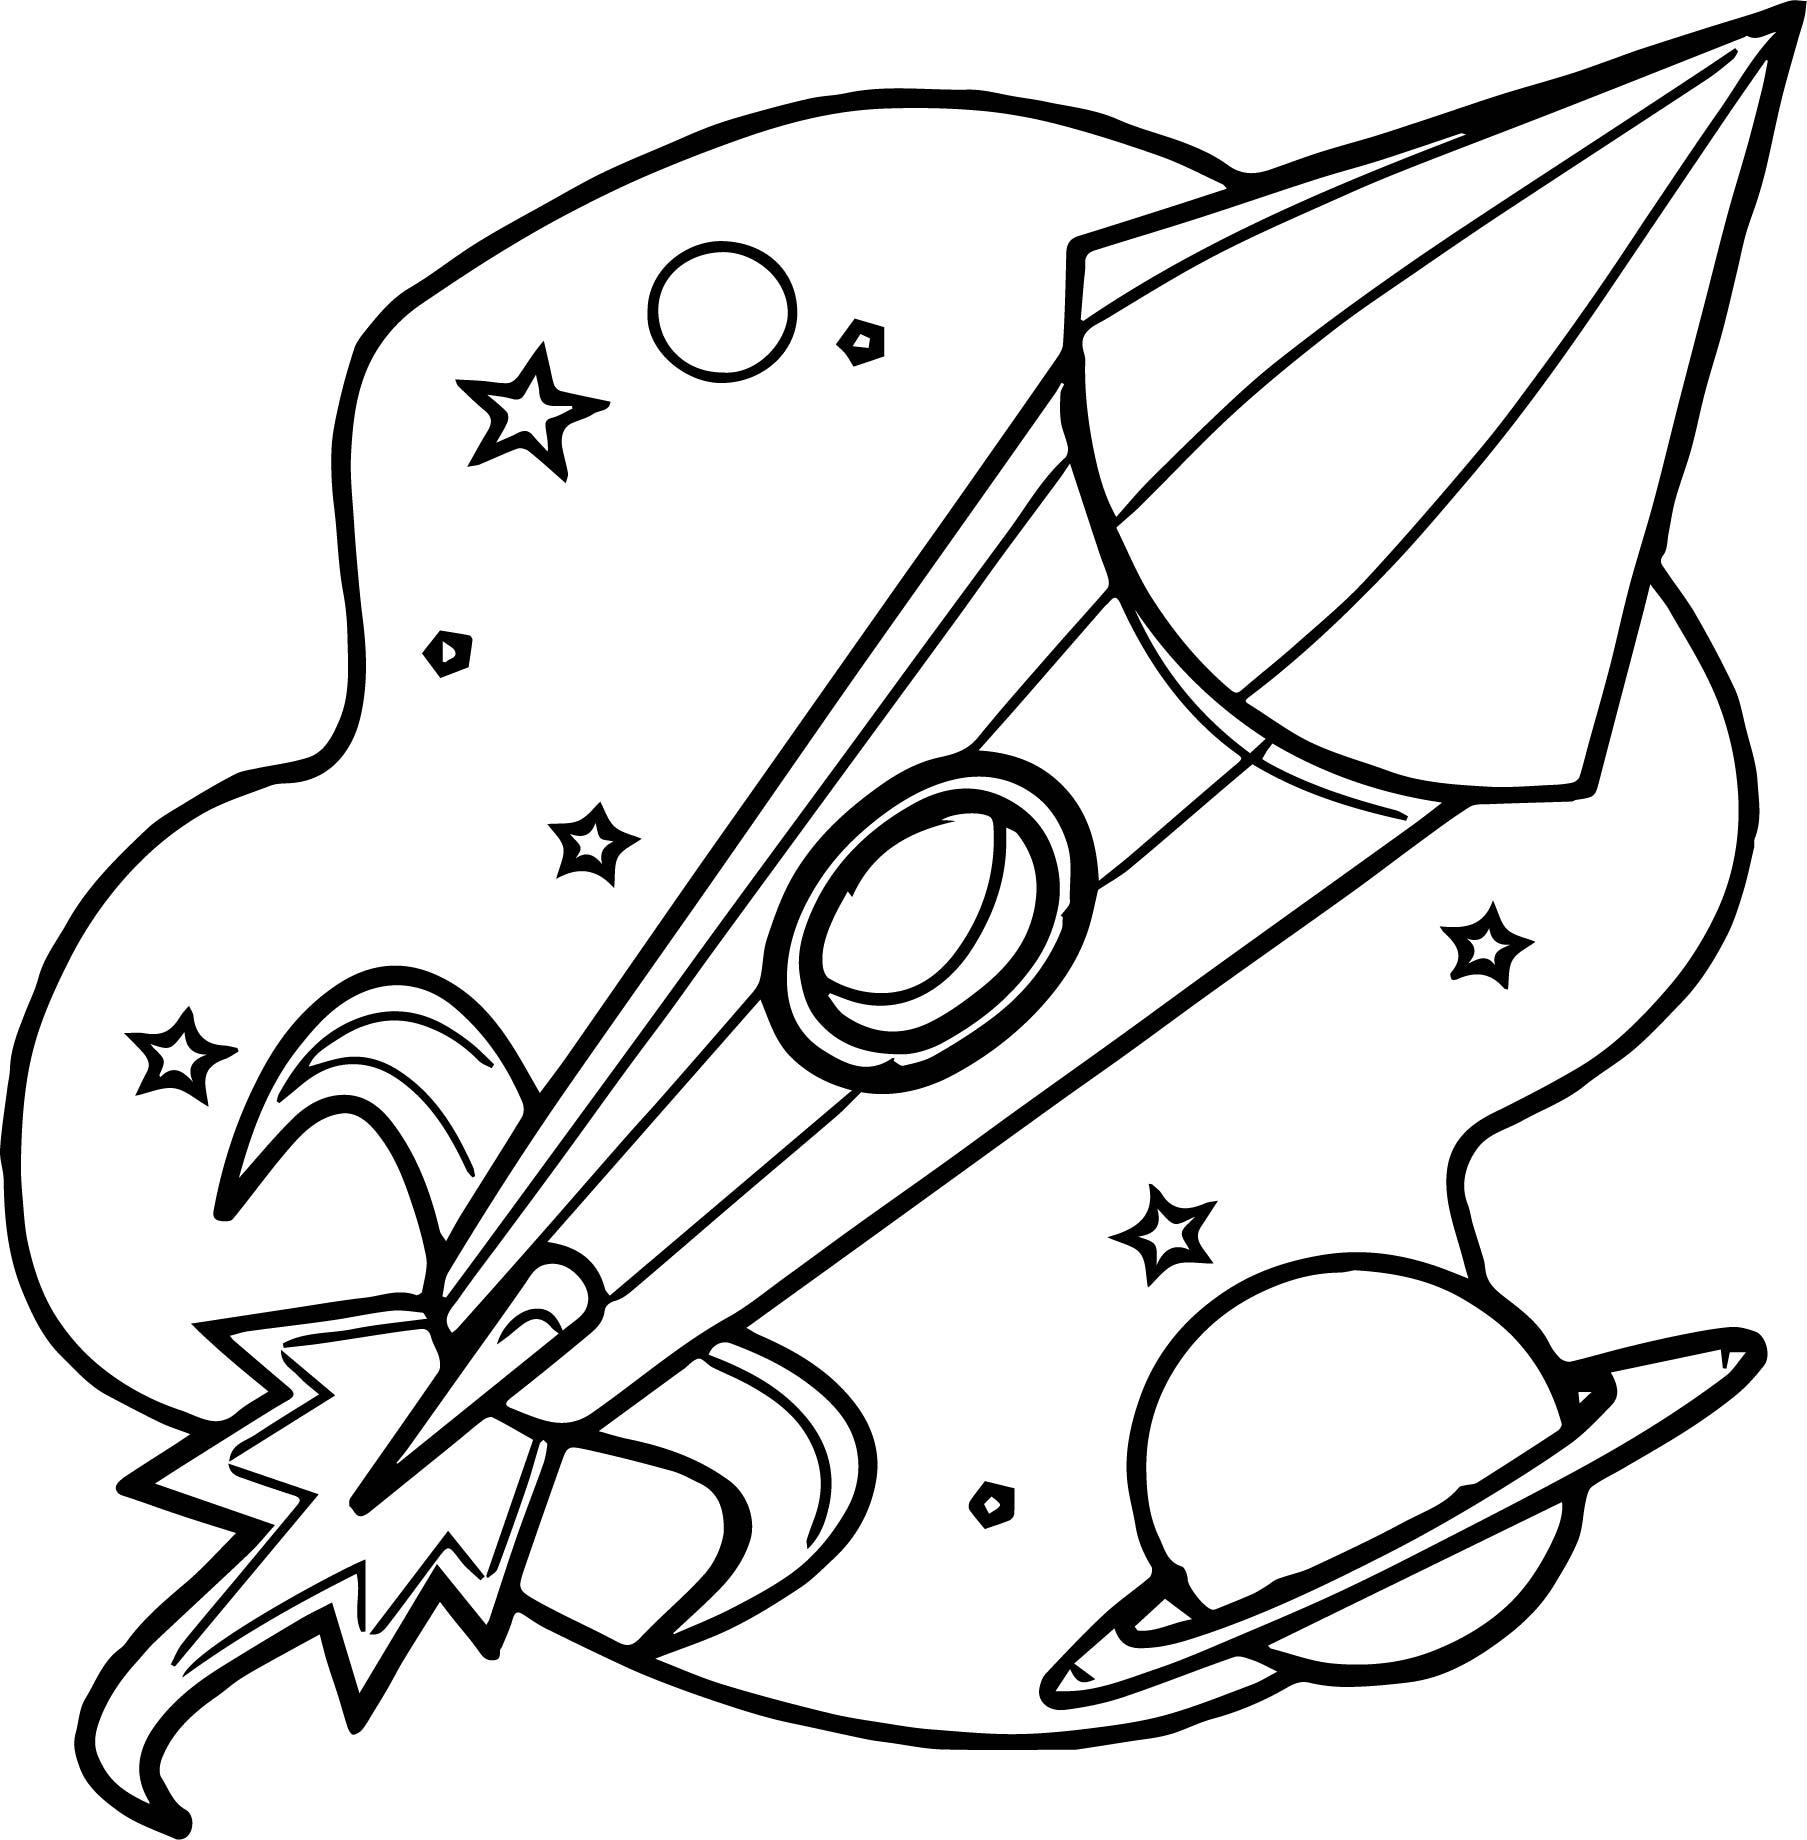 Astronaut Rocket Launcher Coloring Page